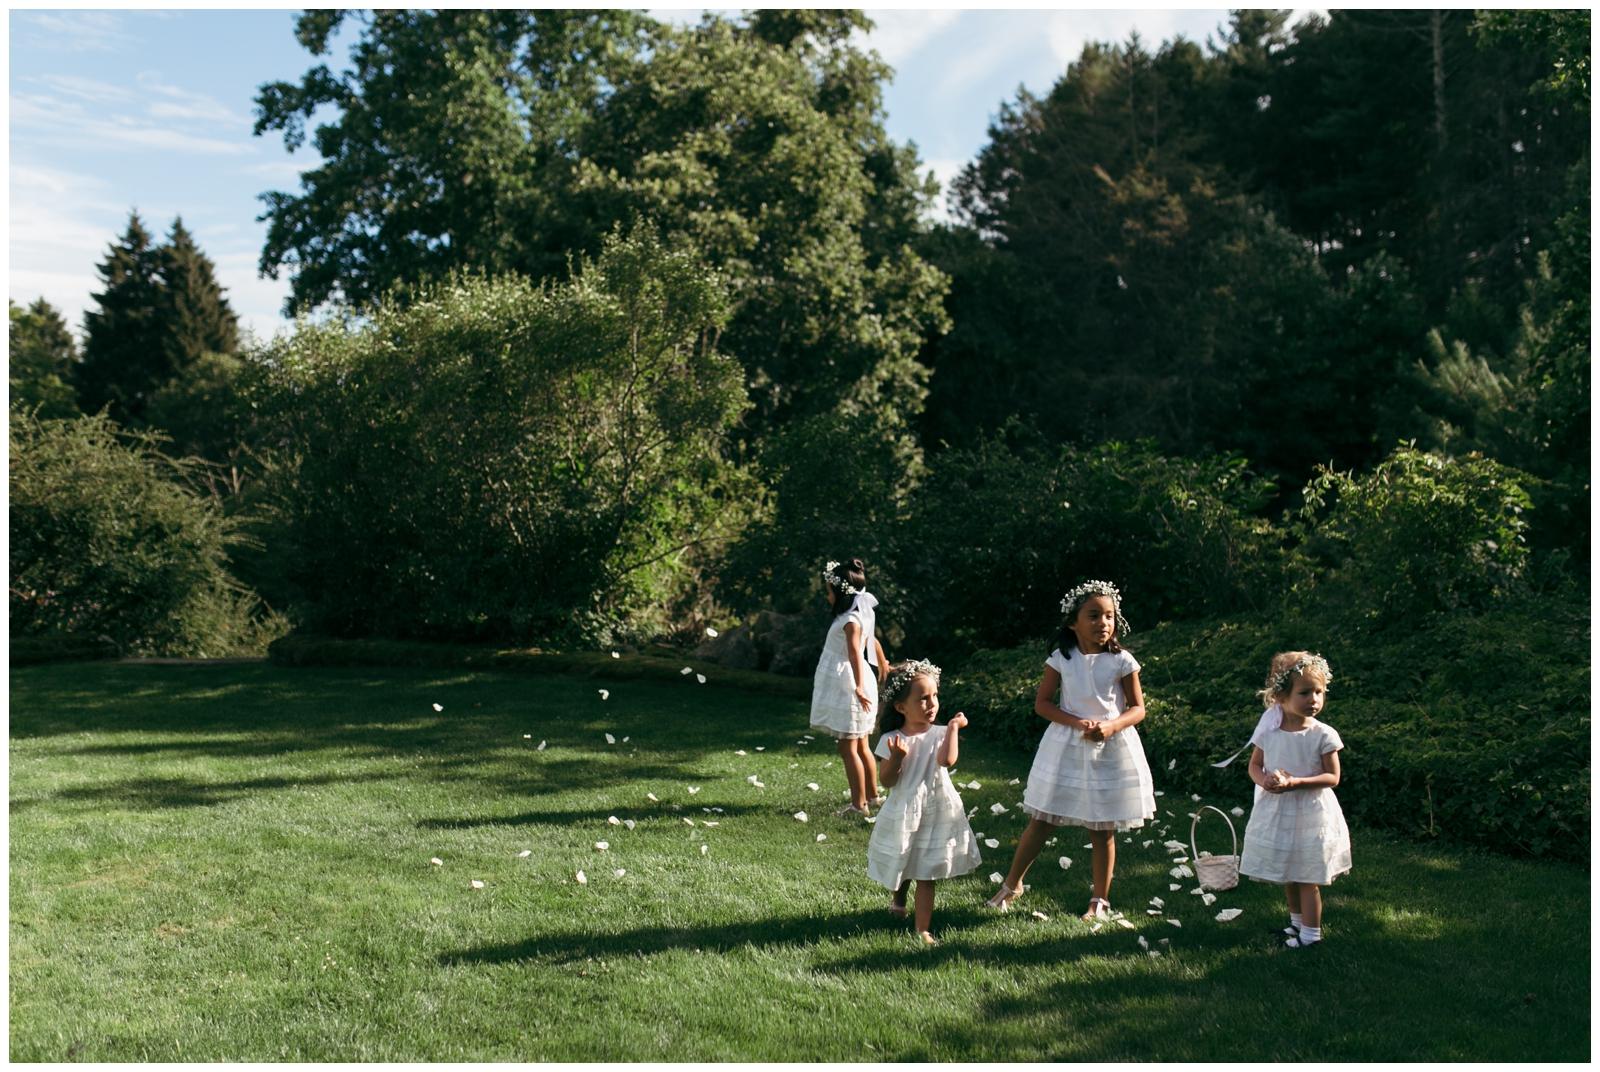 Moraine-Farm-wedding-Bailey-Q-Photo-Massachusetts-wedding-photpgrapher-065.jpg